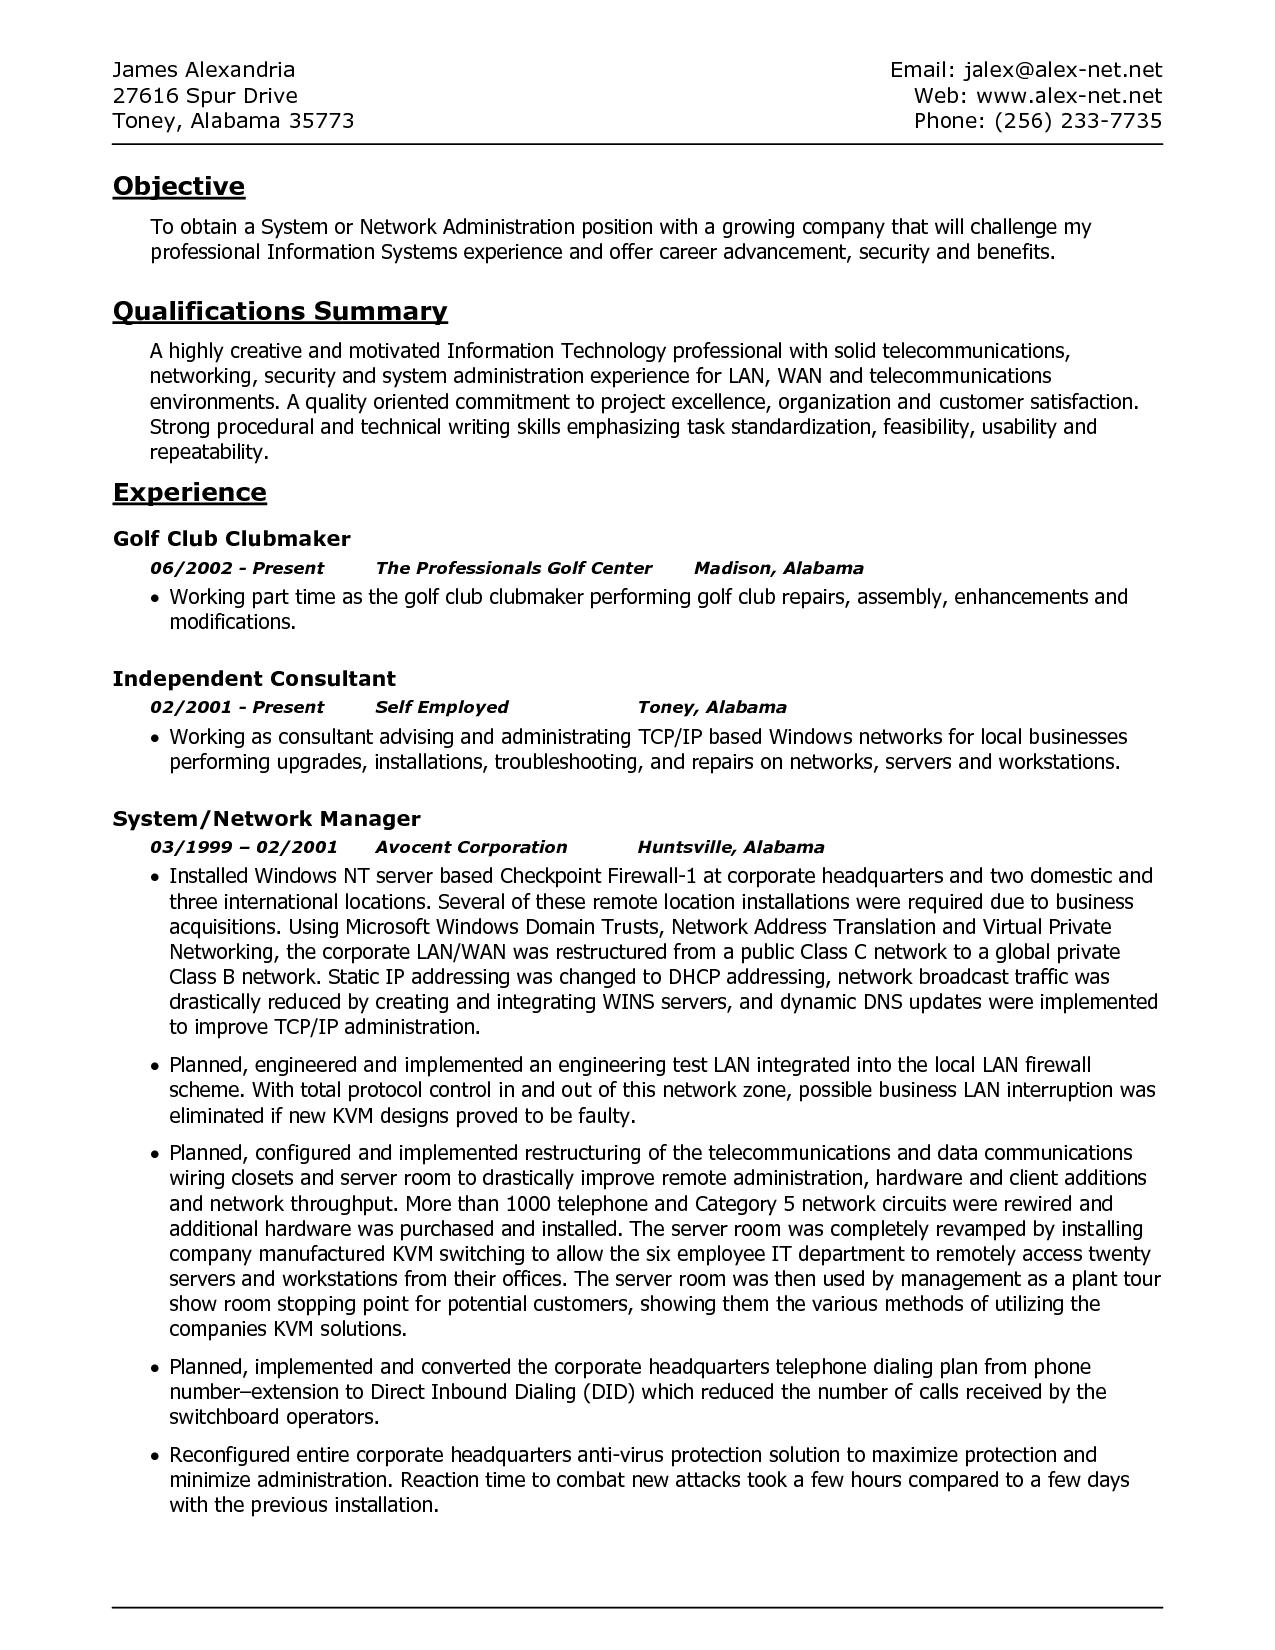 2018 Best Resume Format